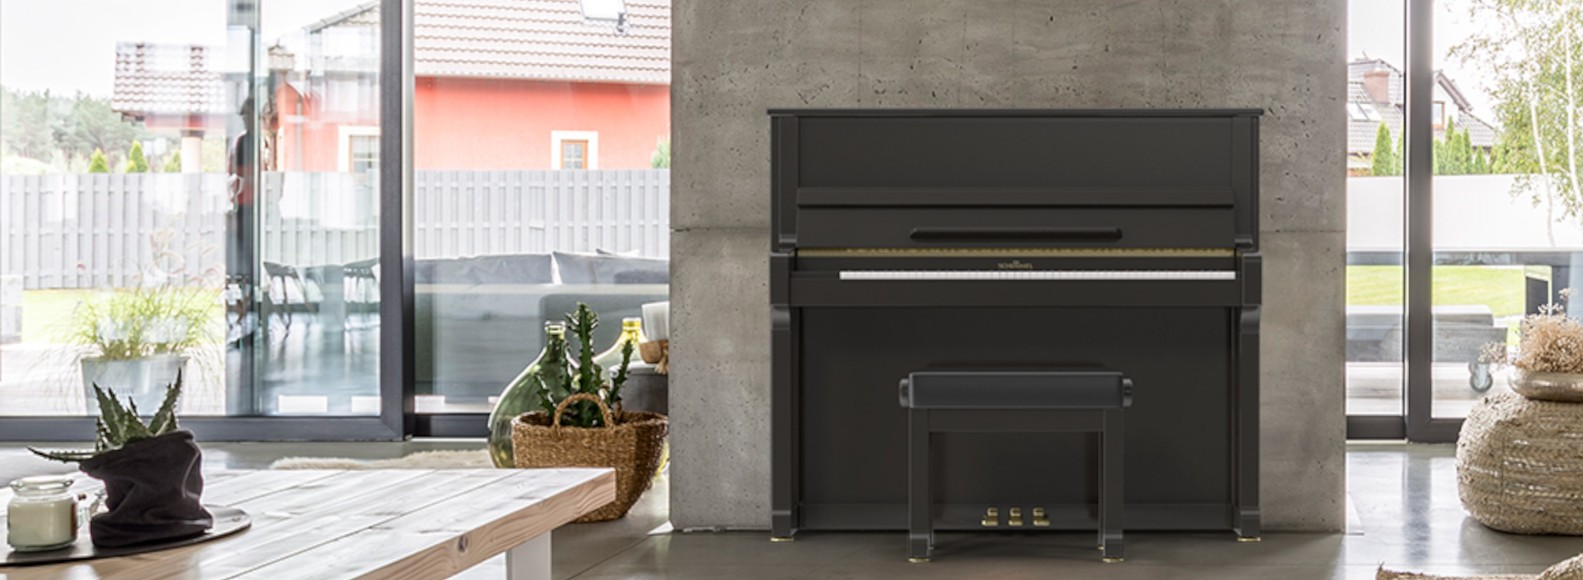 Pianos Wilh Steinberg